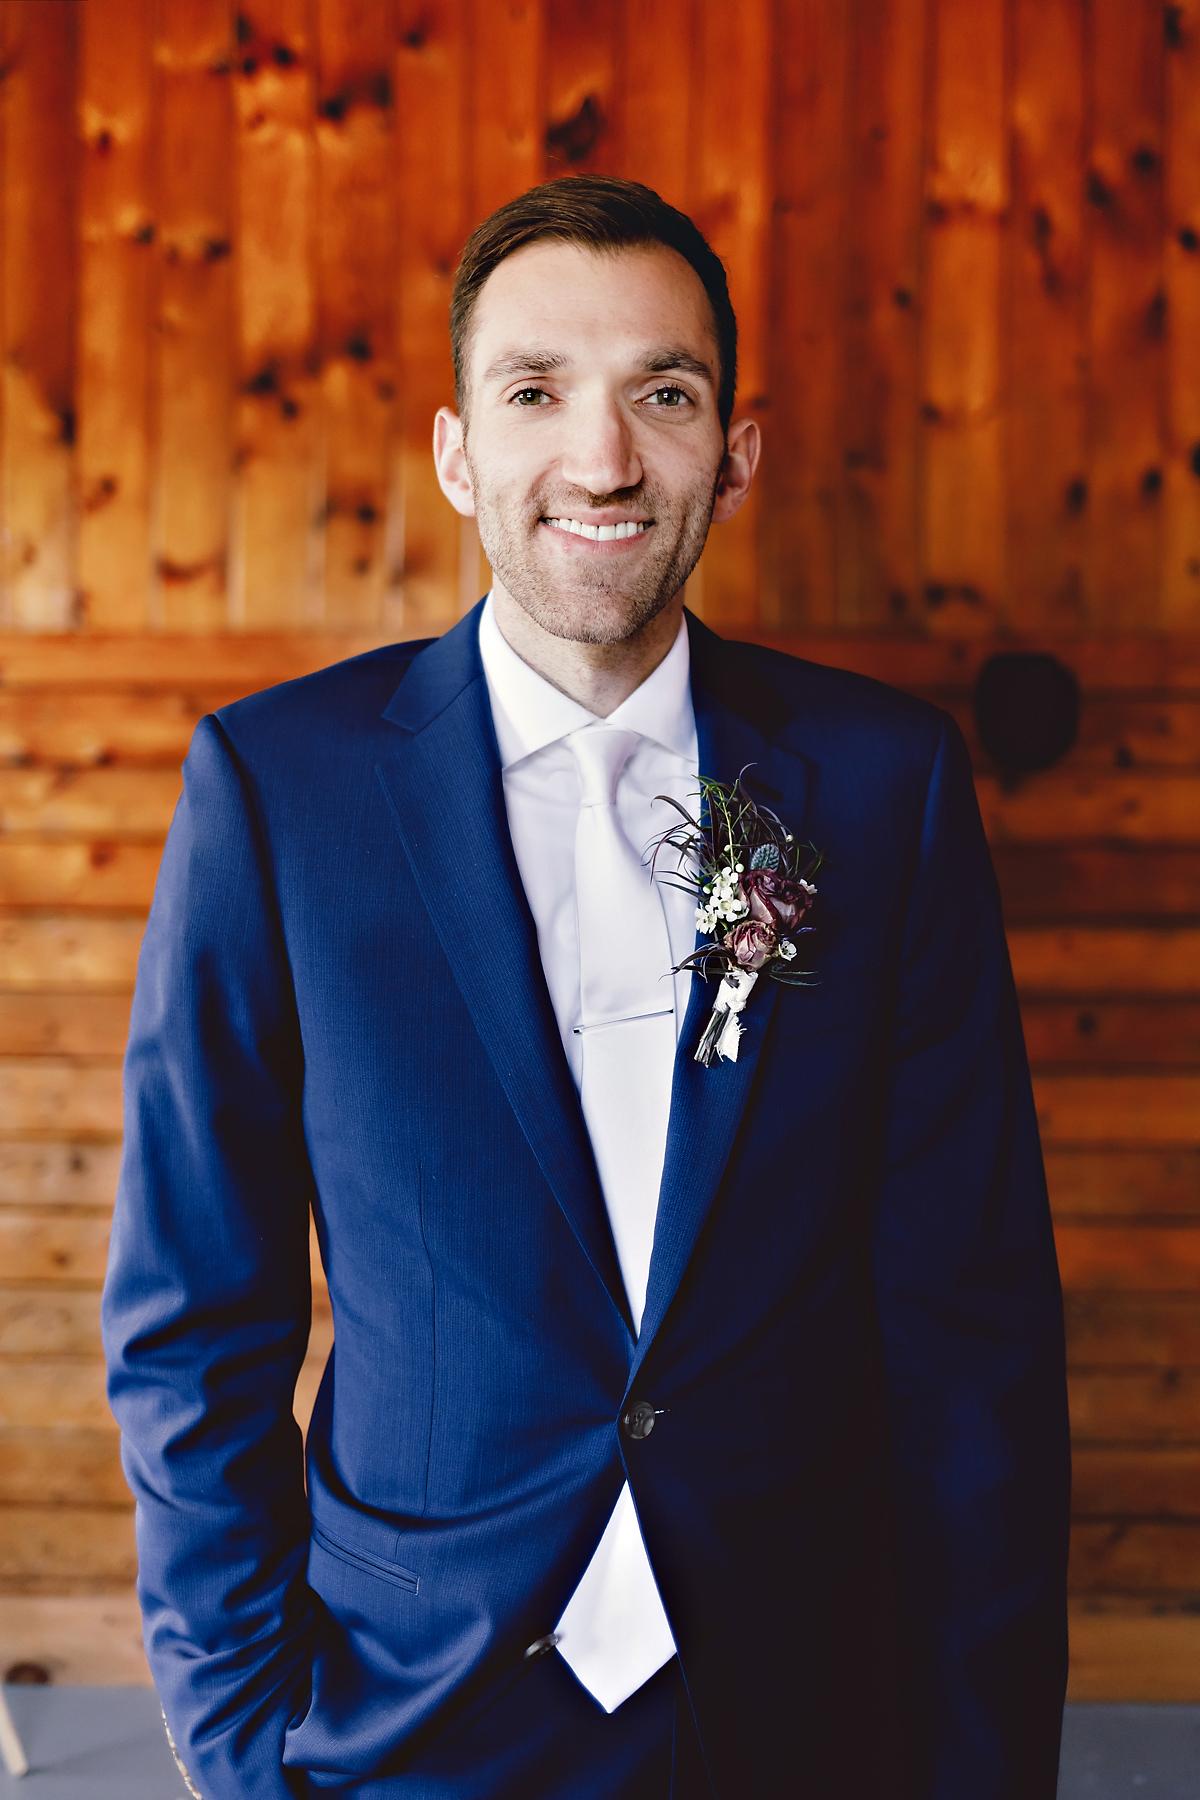 Barn at liberty farms wedding - 009.JPG